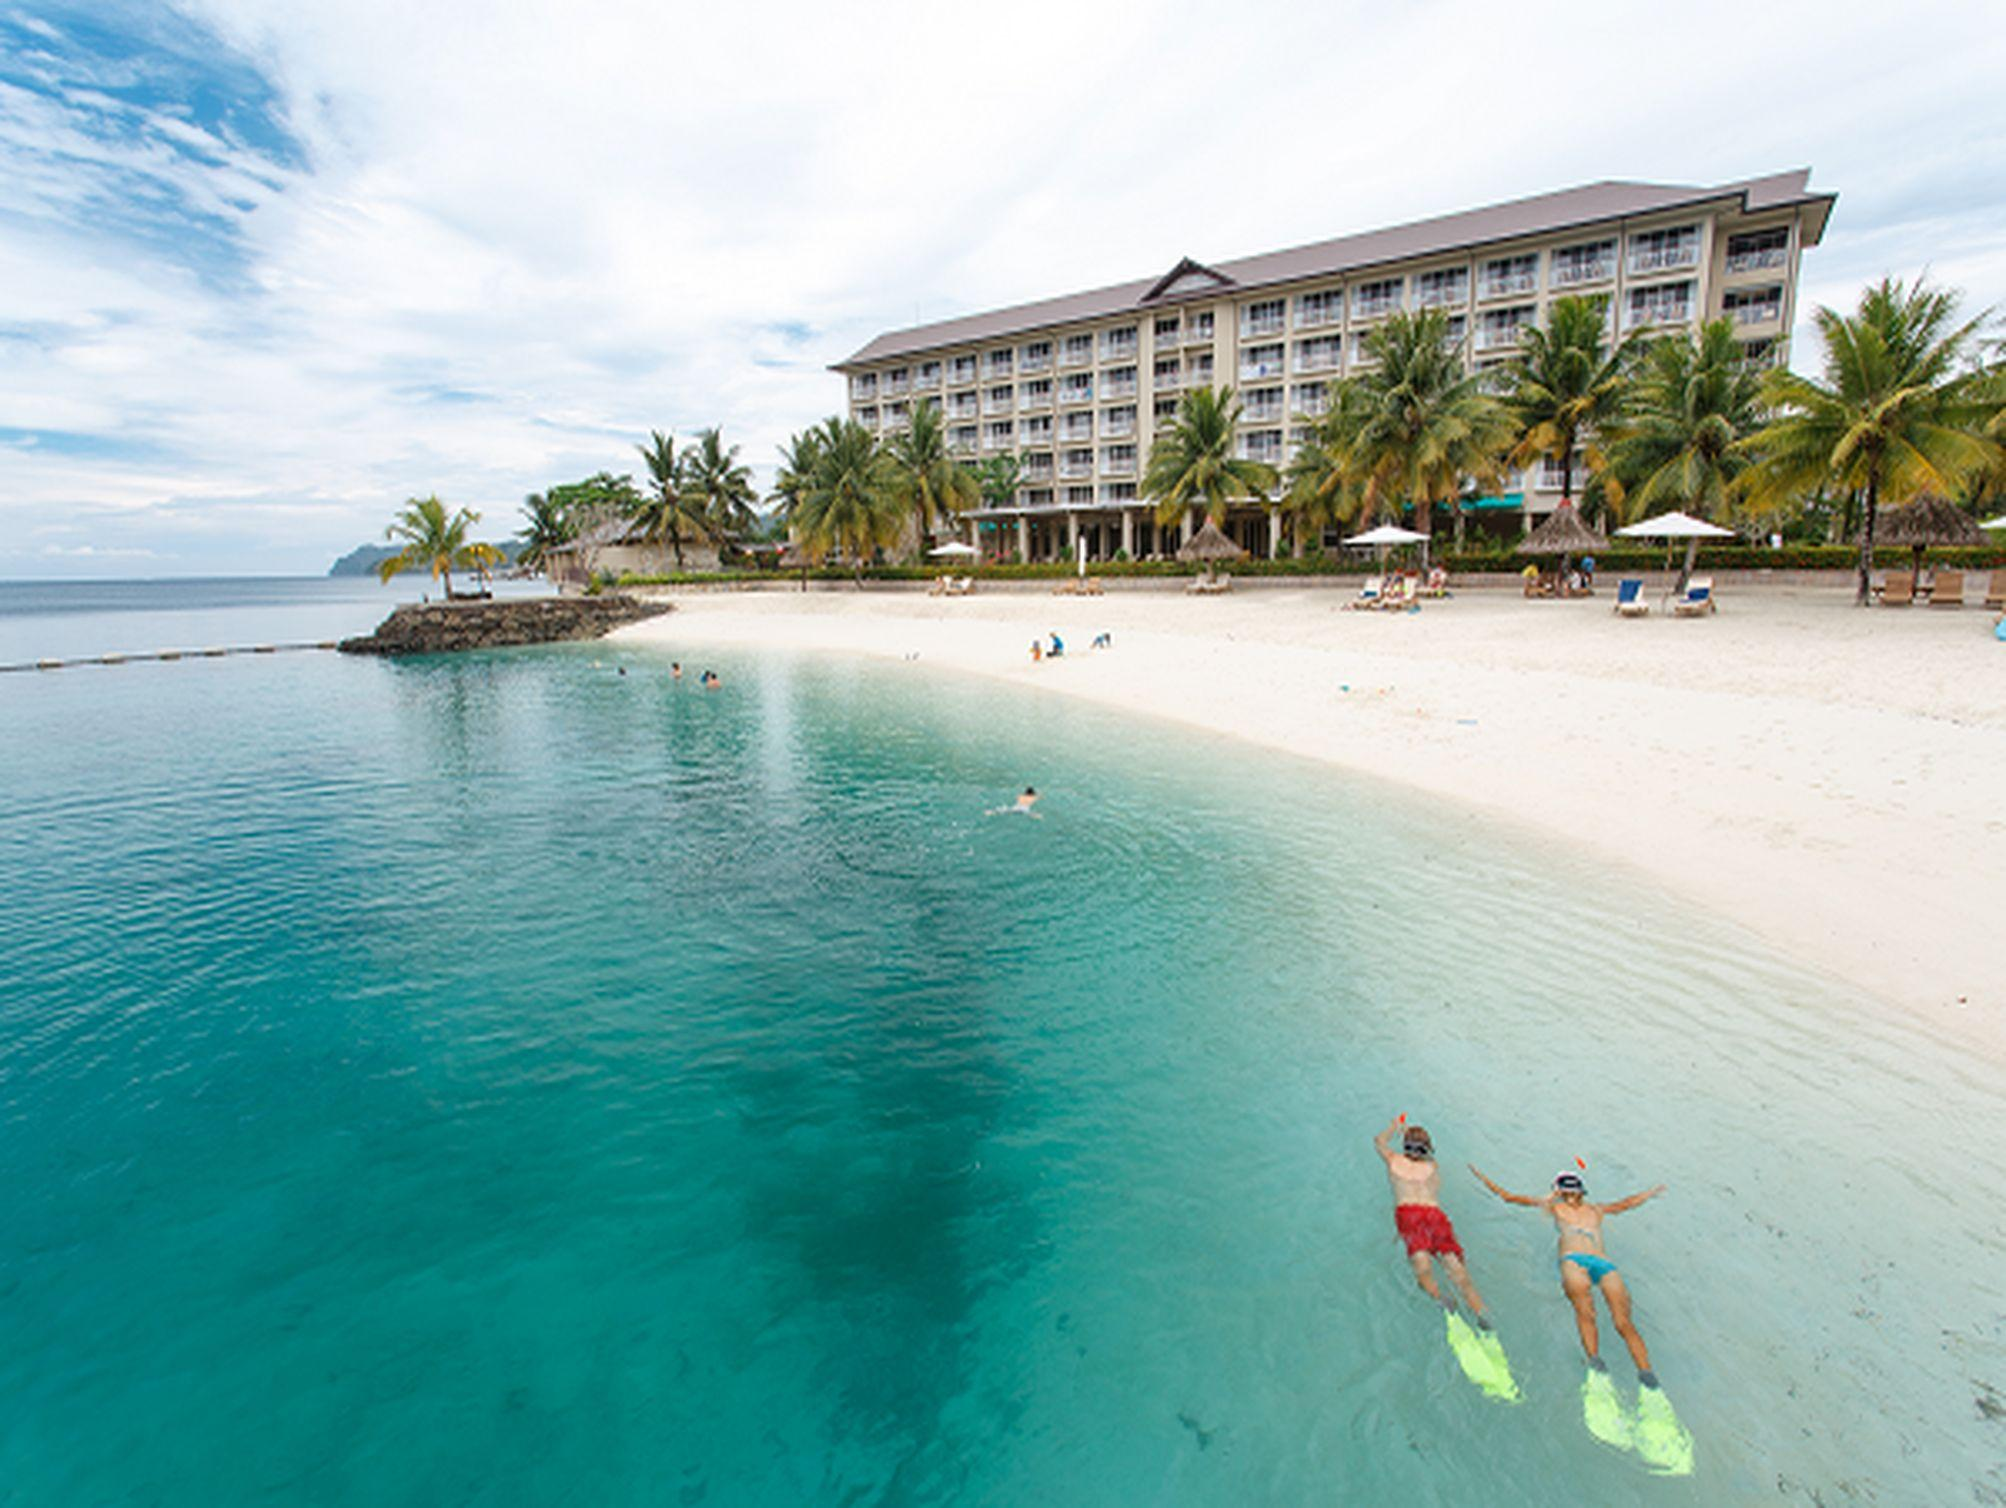 Koror Island Palau Royal Resort By Nikko Hotels In Pacific Ocean And Australia